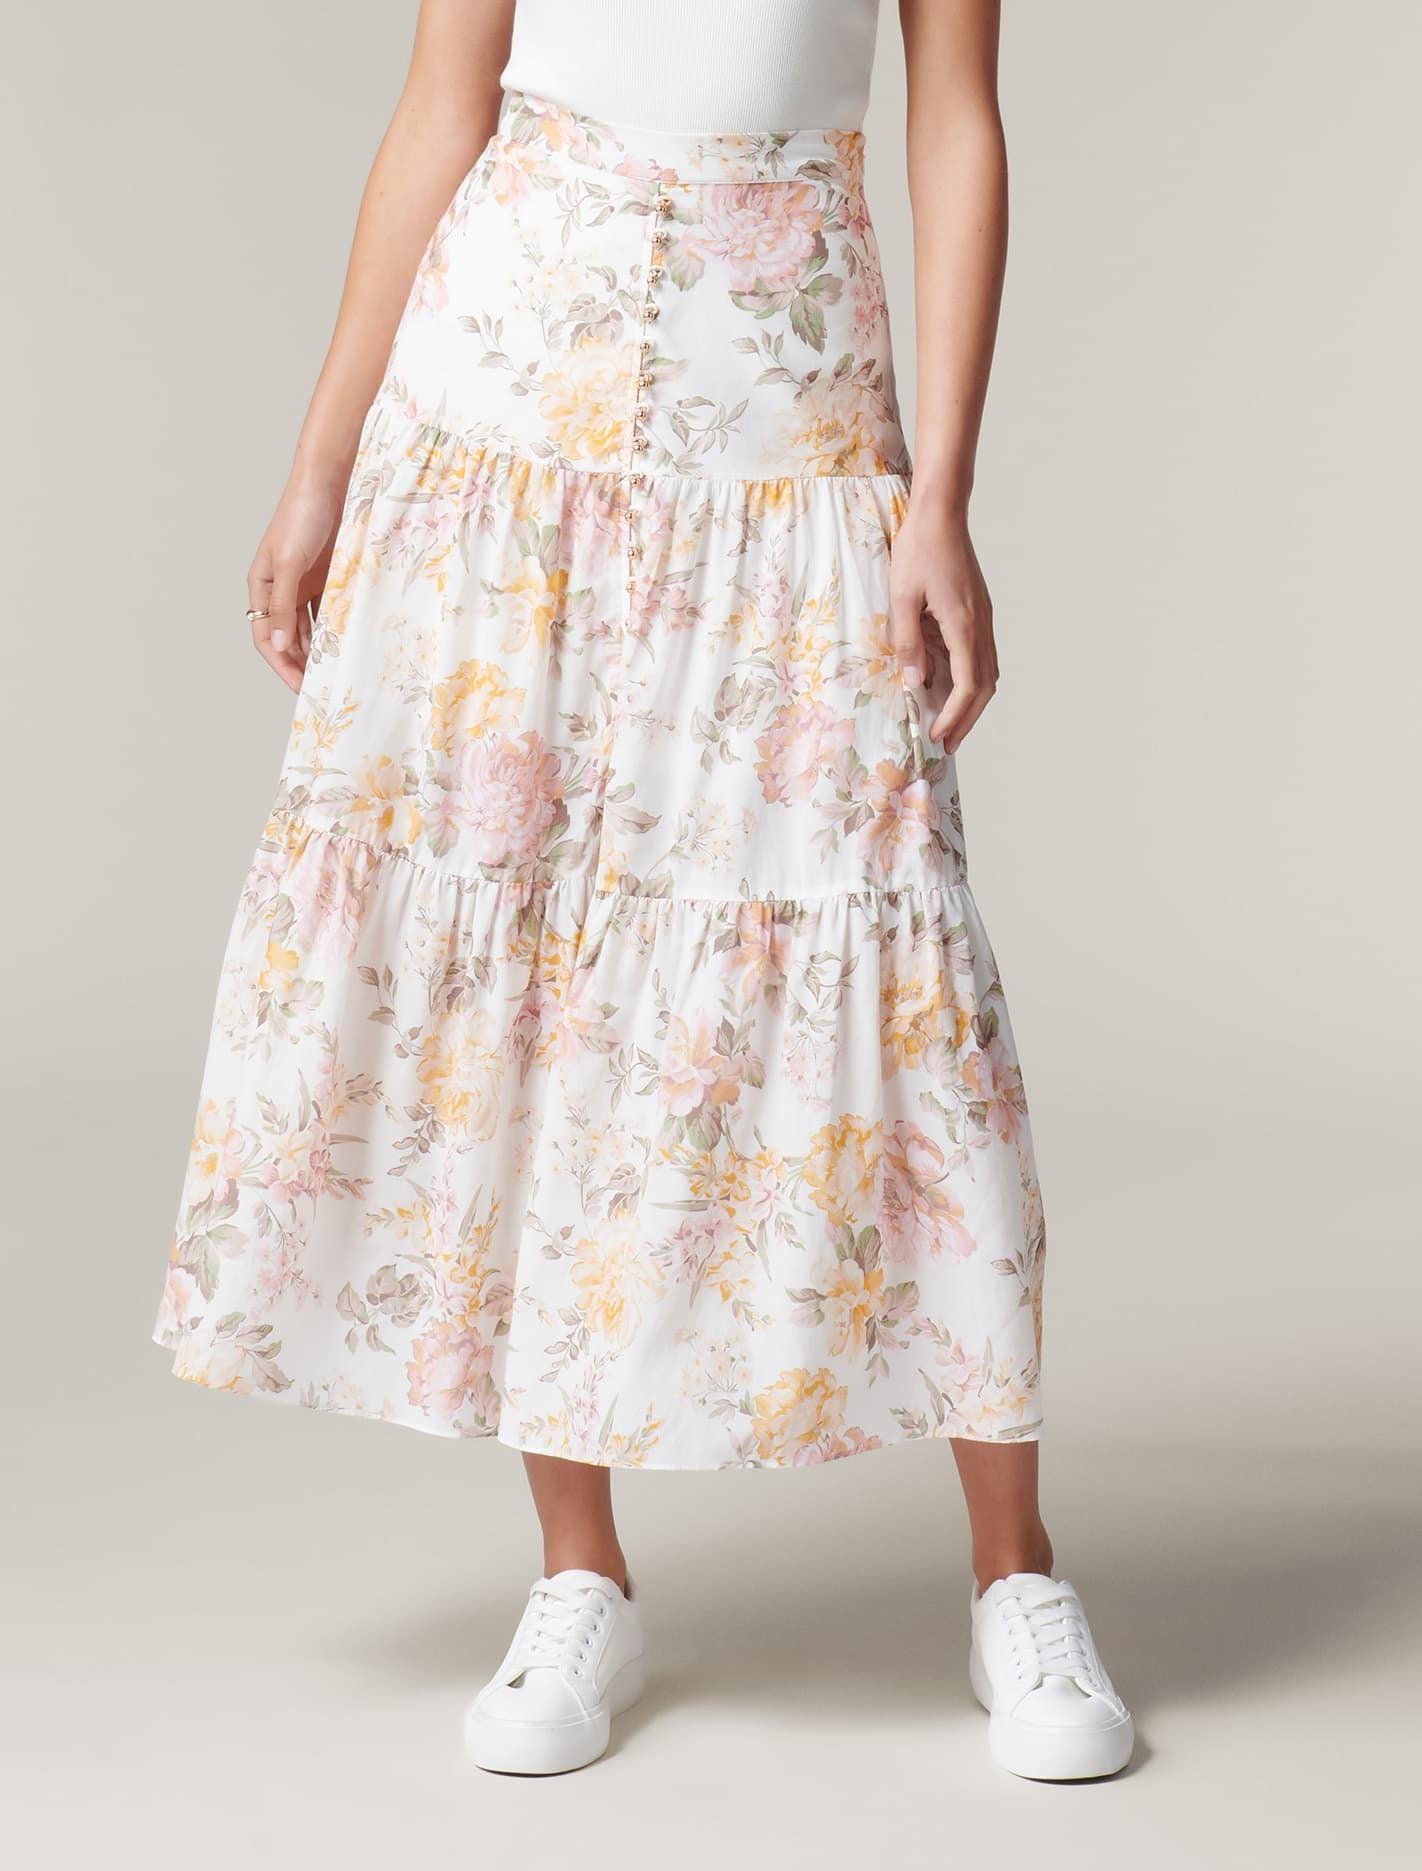 1980s Clothing, Fashion | 80s Style Clothes Fleur Tiered Maxi Skirt - Vintage Splendor - 384 $109.99 AT vintagedancer.com